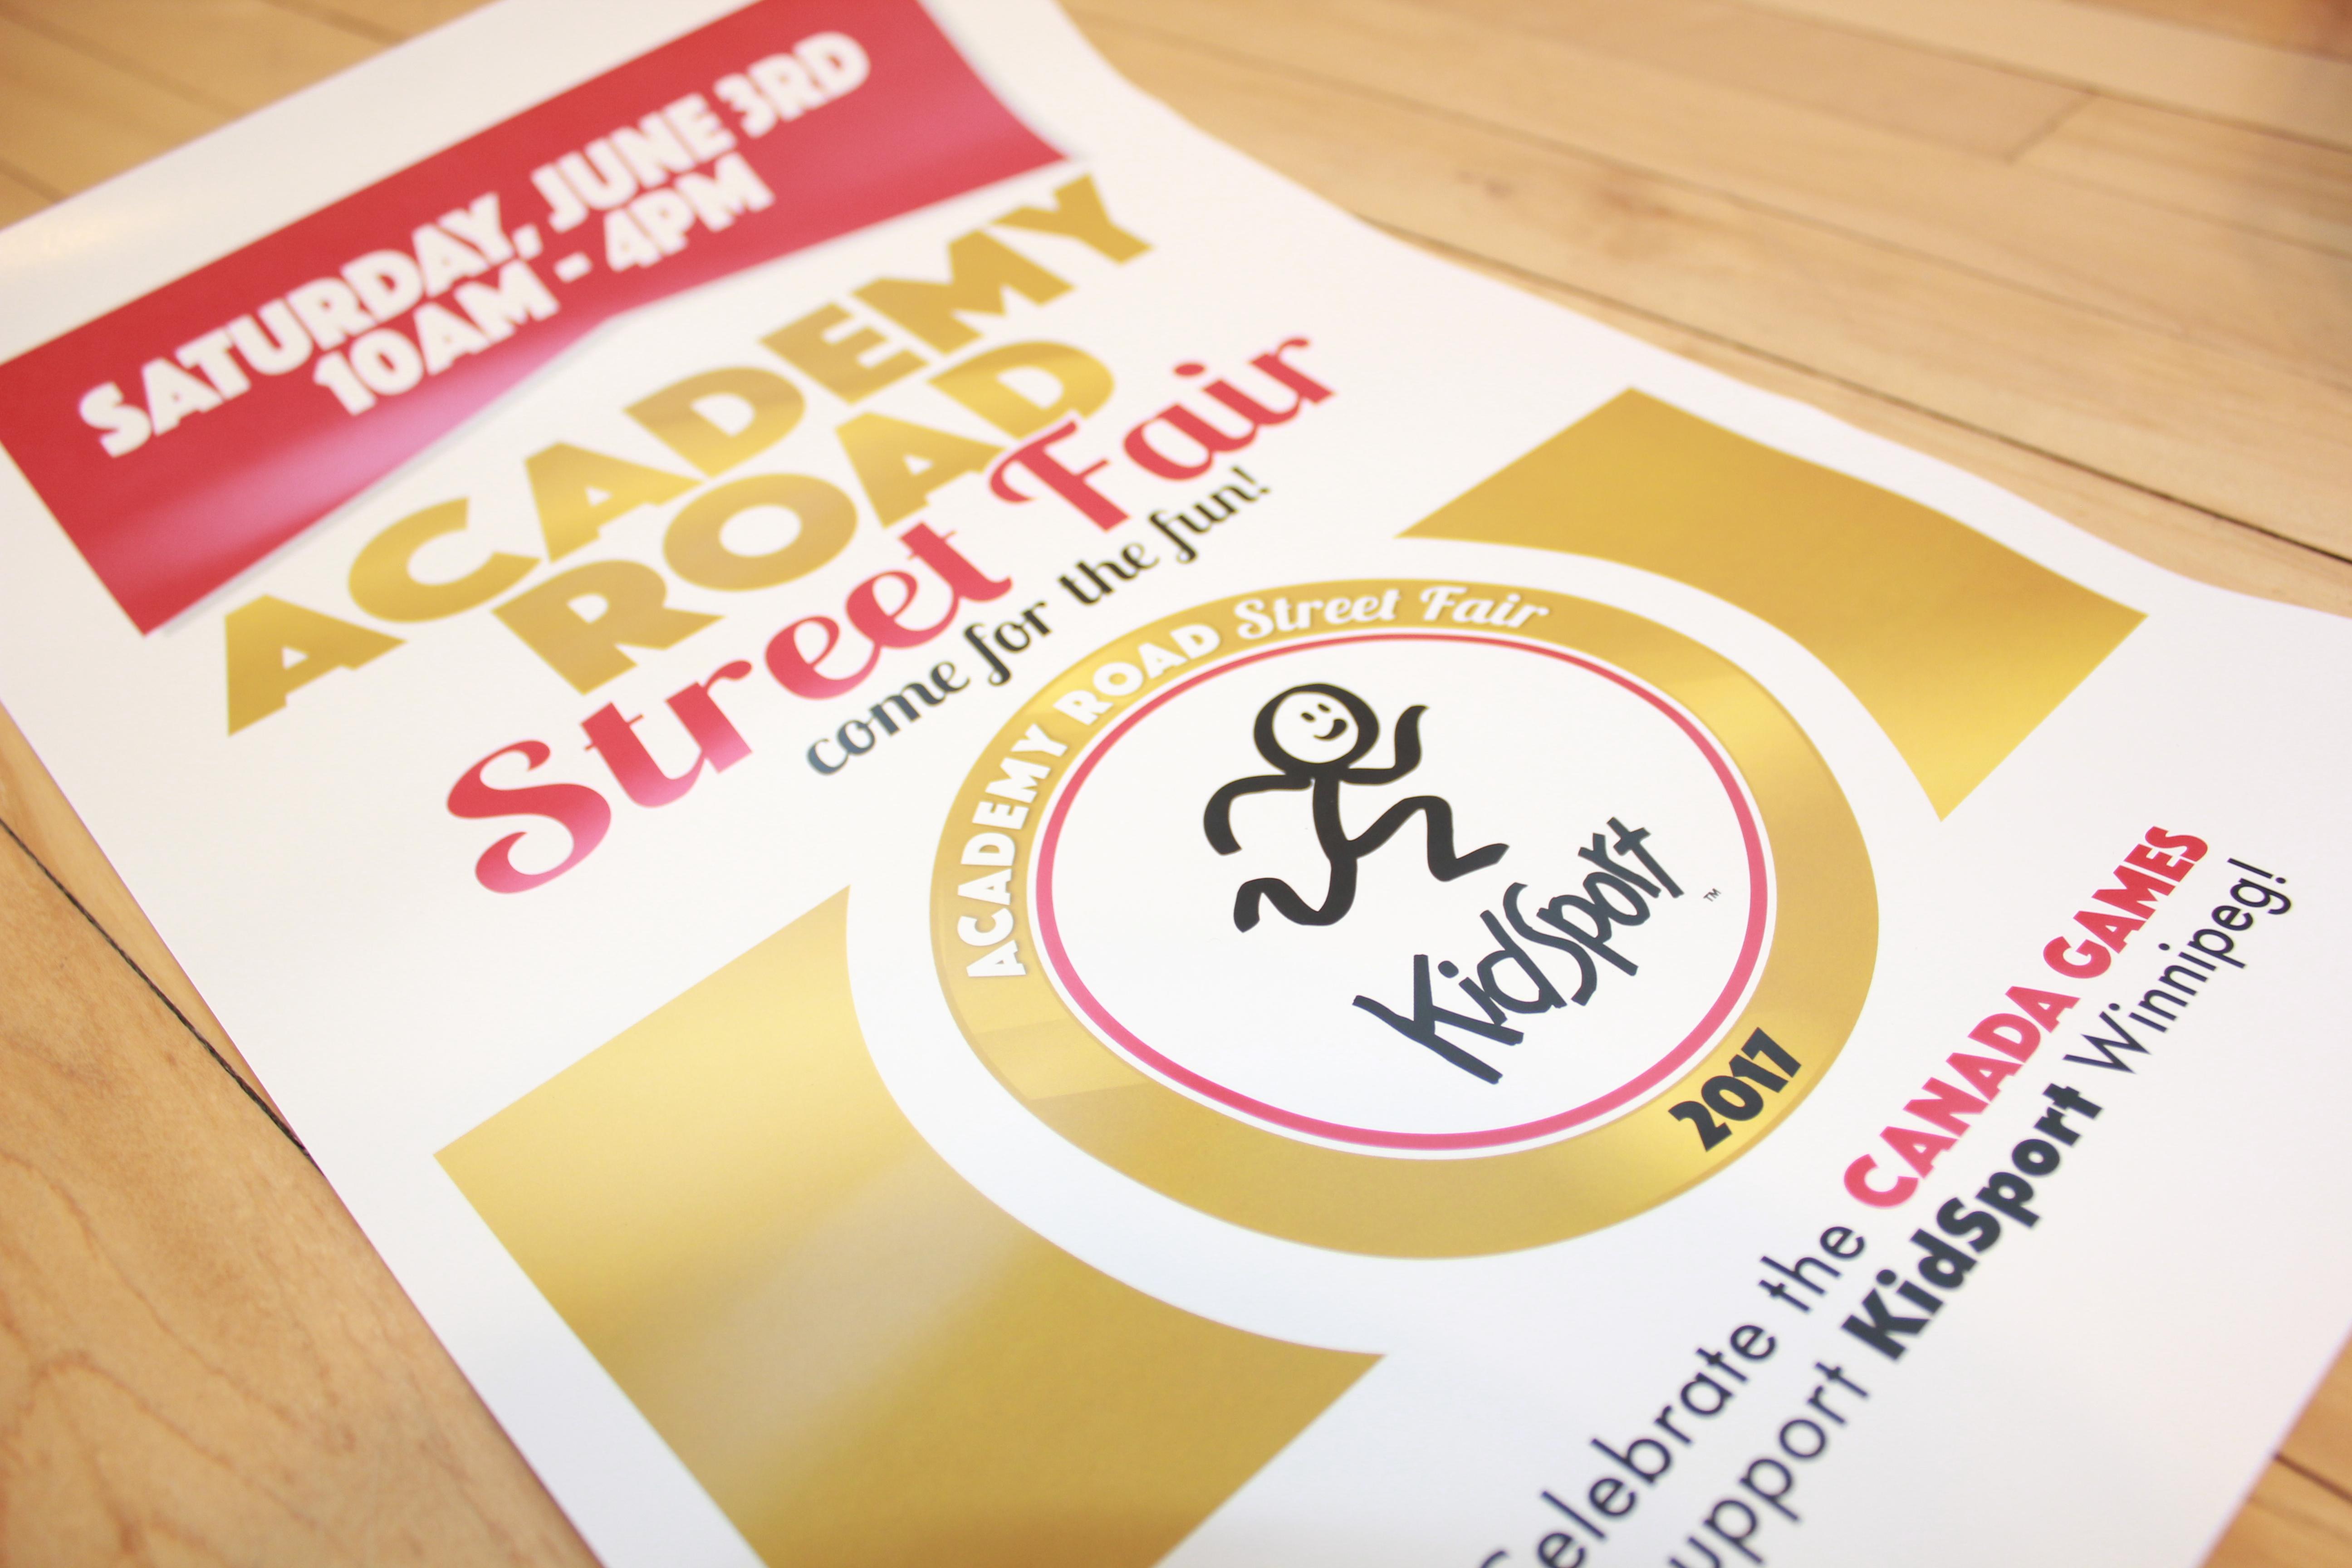 Academy Street Fair Poster